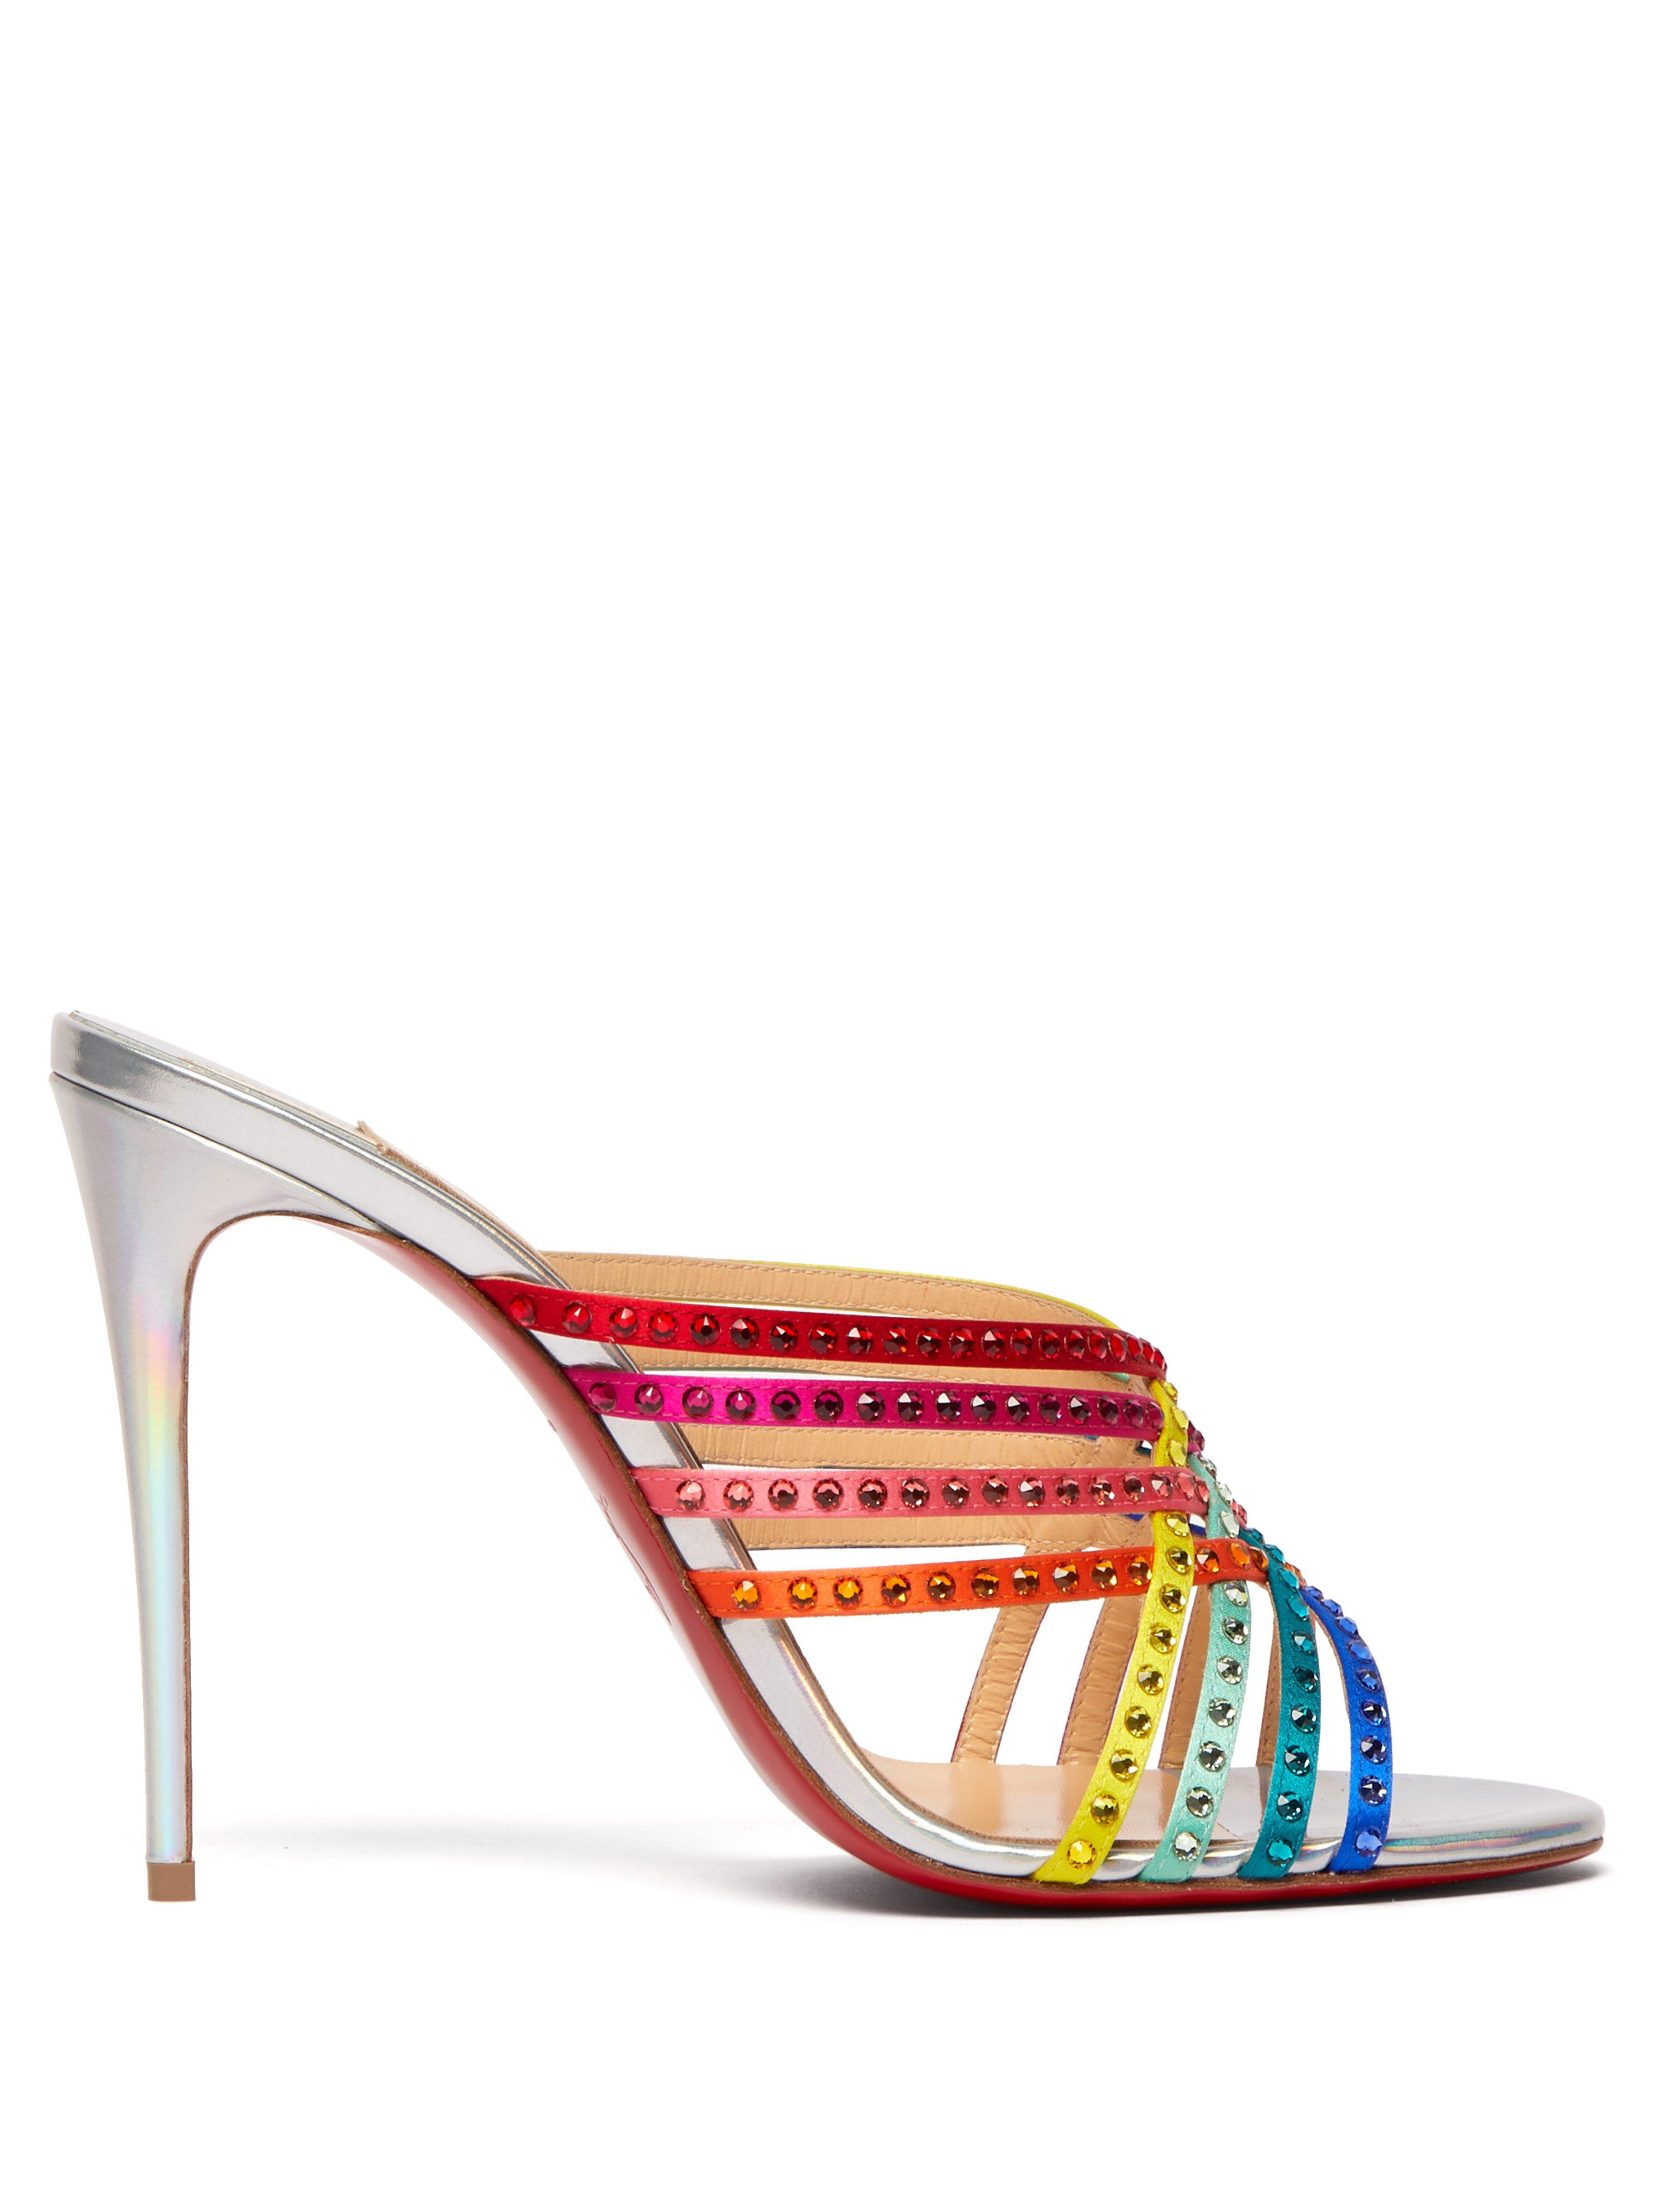 a842e39c1b36 Christian Louboutin Marthastrass Rainbow Crystal Mules - Save 12% - Lyst